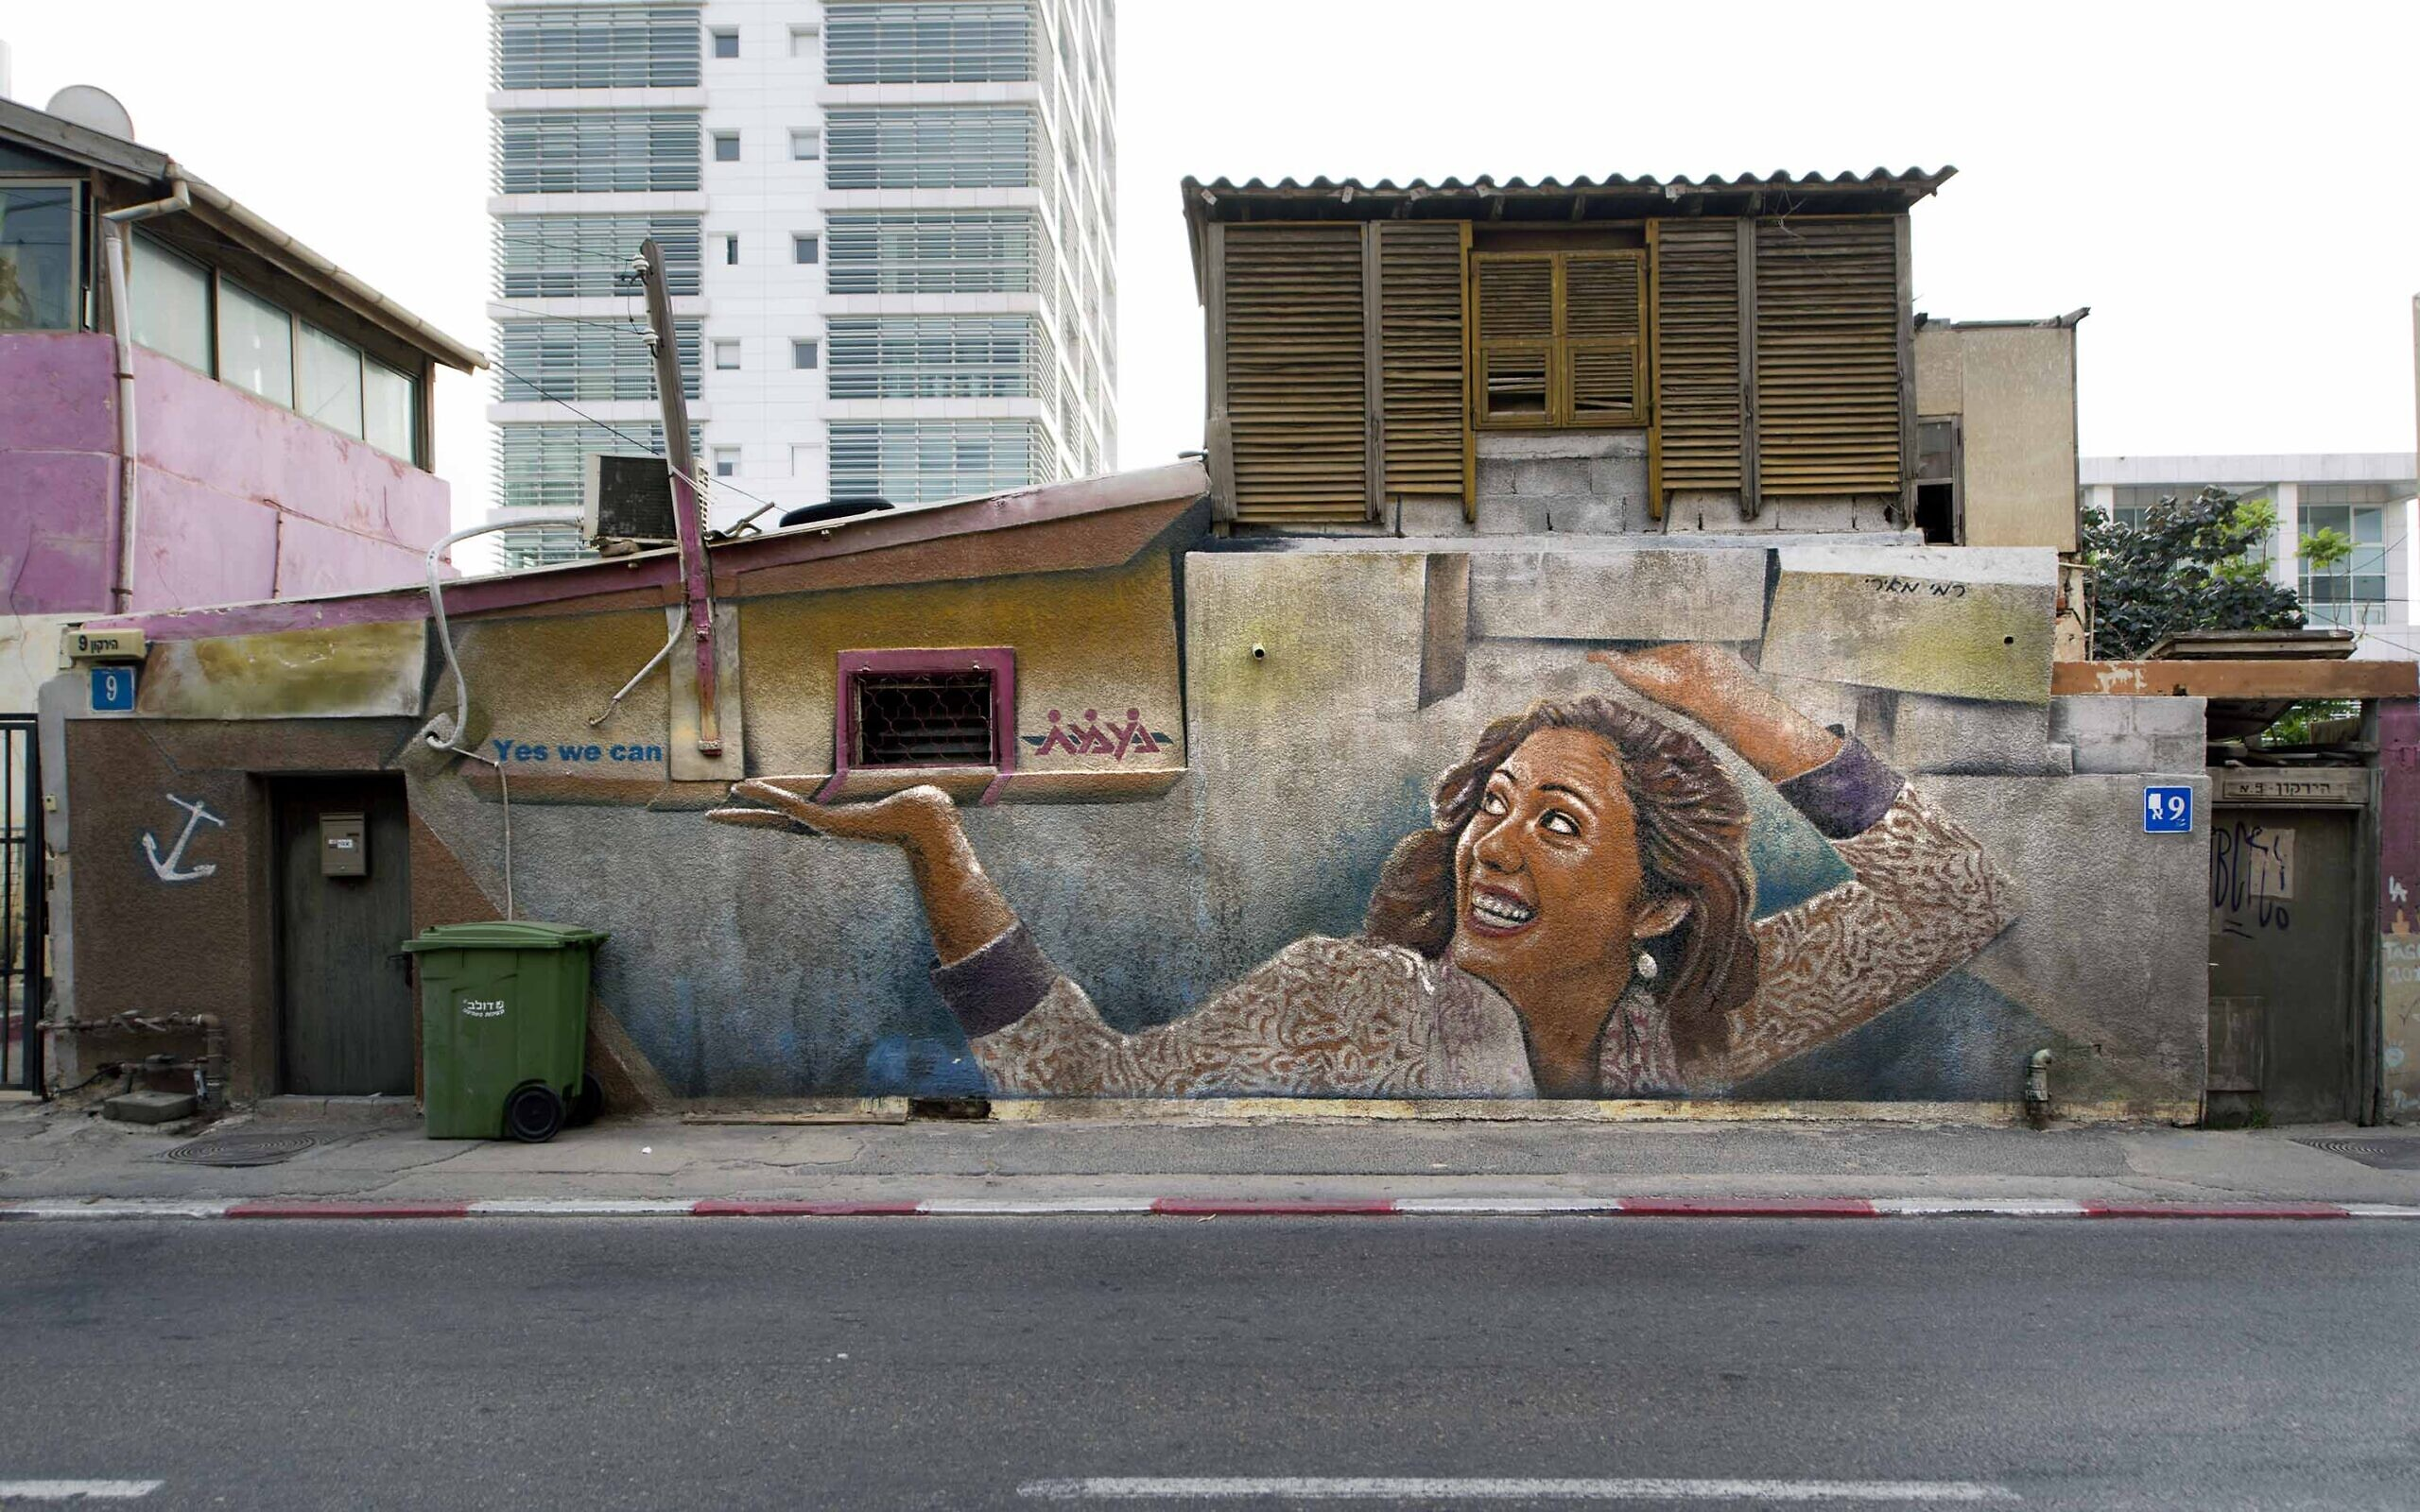 Street art in Tel Aviv by Rami Meiri. (Lord K2)